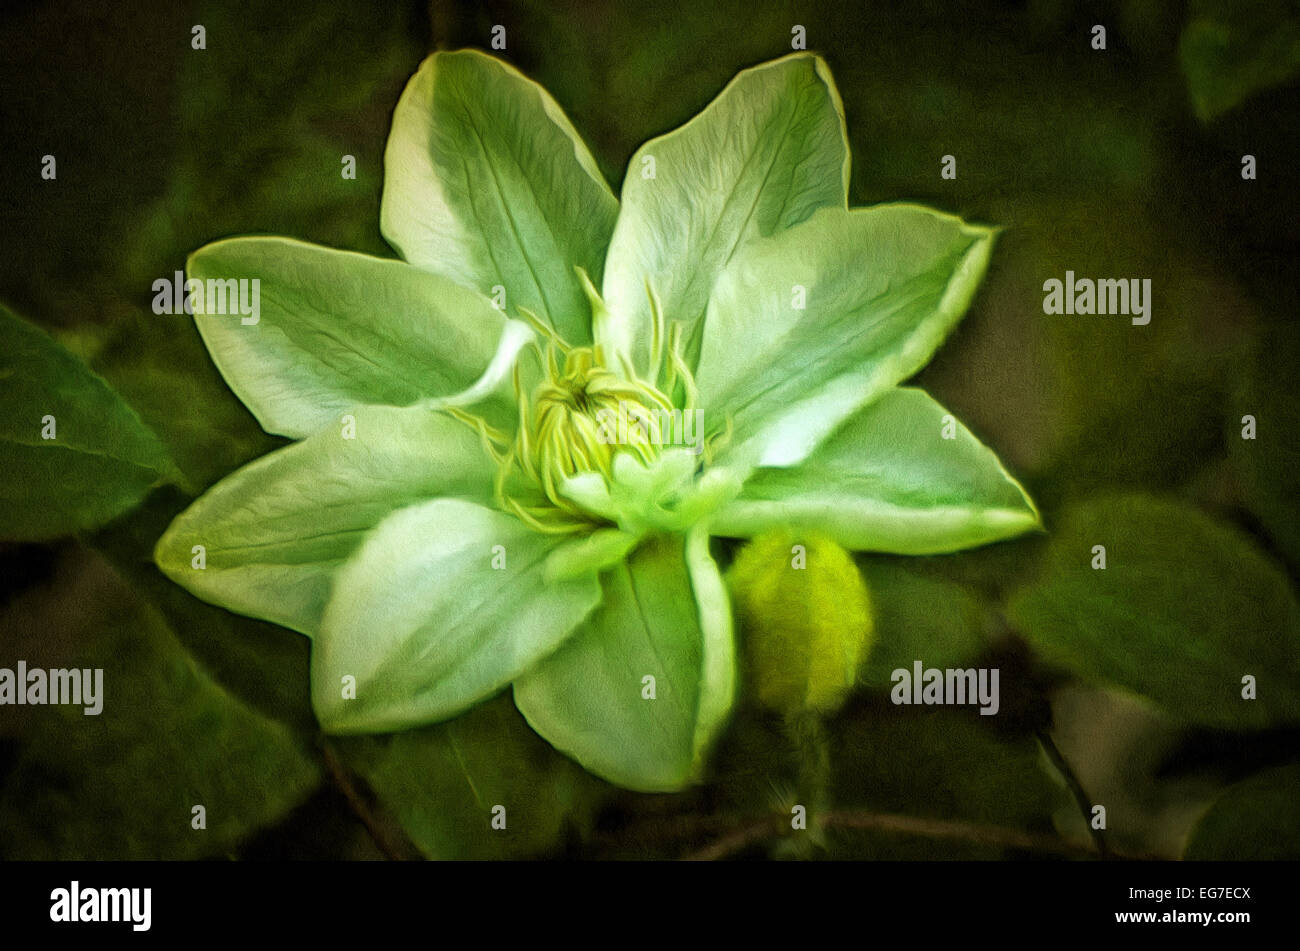 Clematis spinous (lat. Clematis aristata) - kind of heat-loving evergreen climbing shrub of the genus Clematis (Clematis) - Stock Image